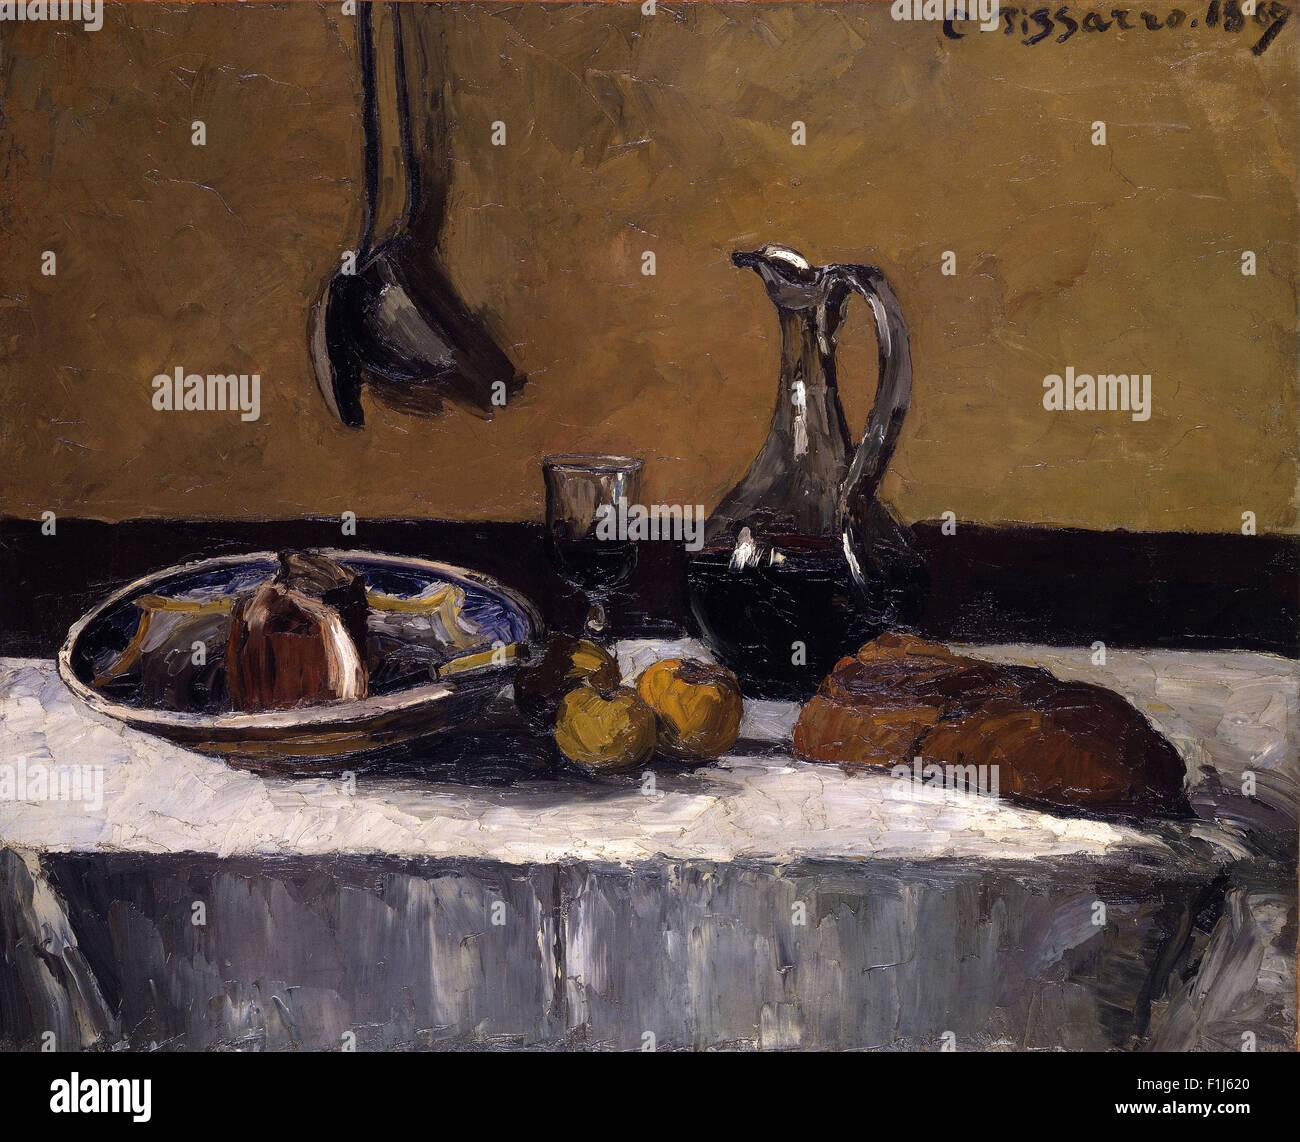 Camille Pissarro - Stillleben Stockbild